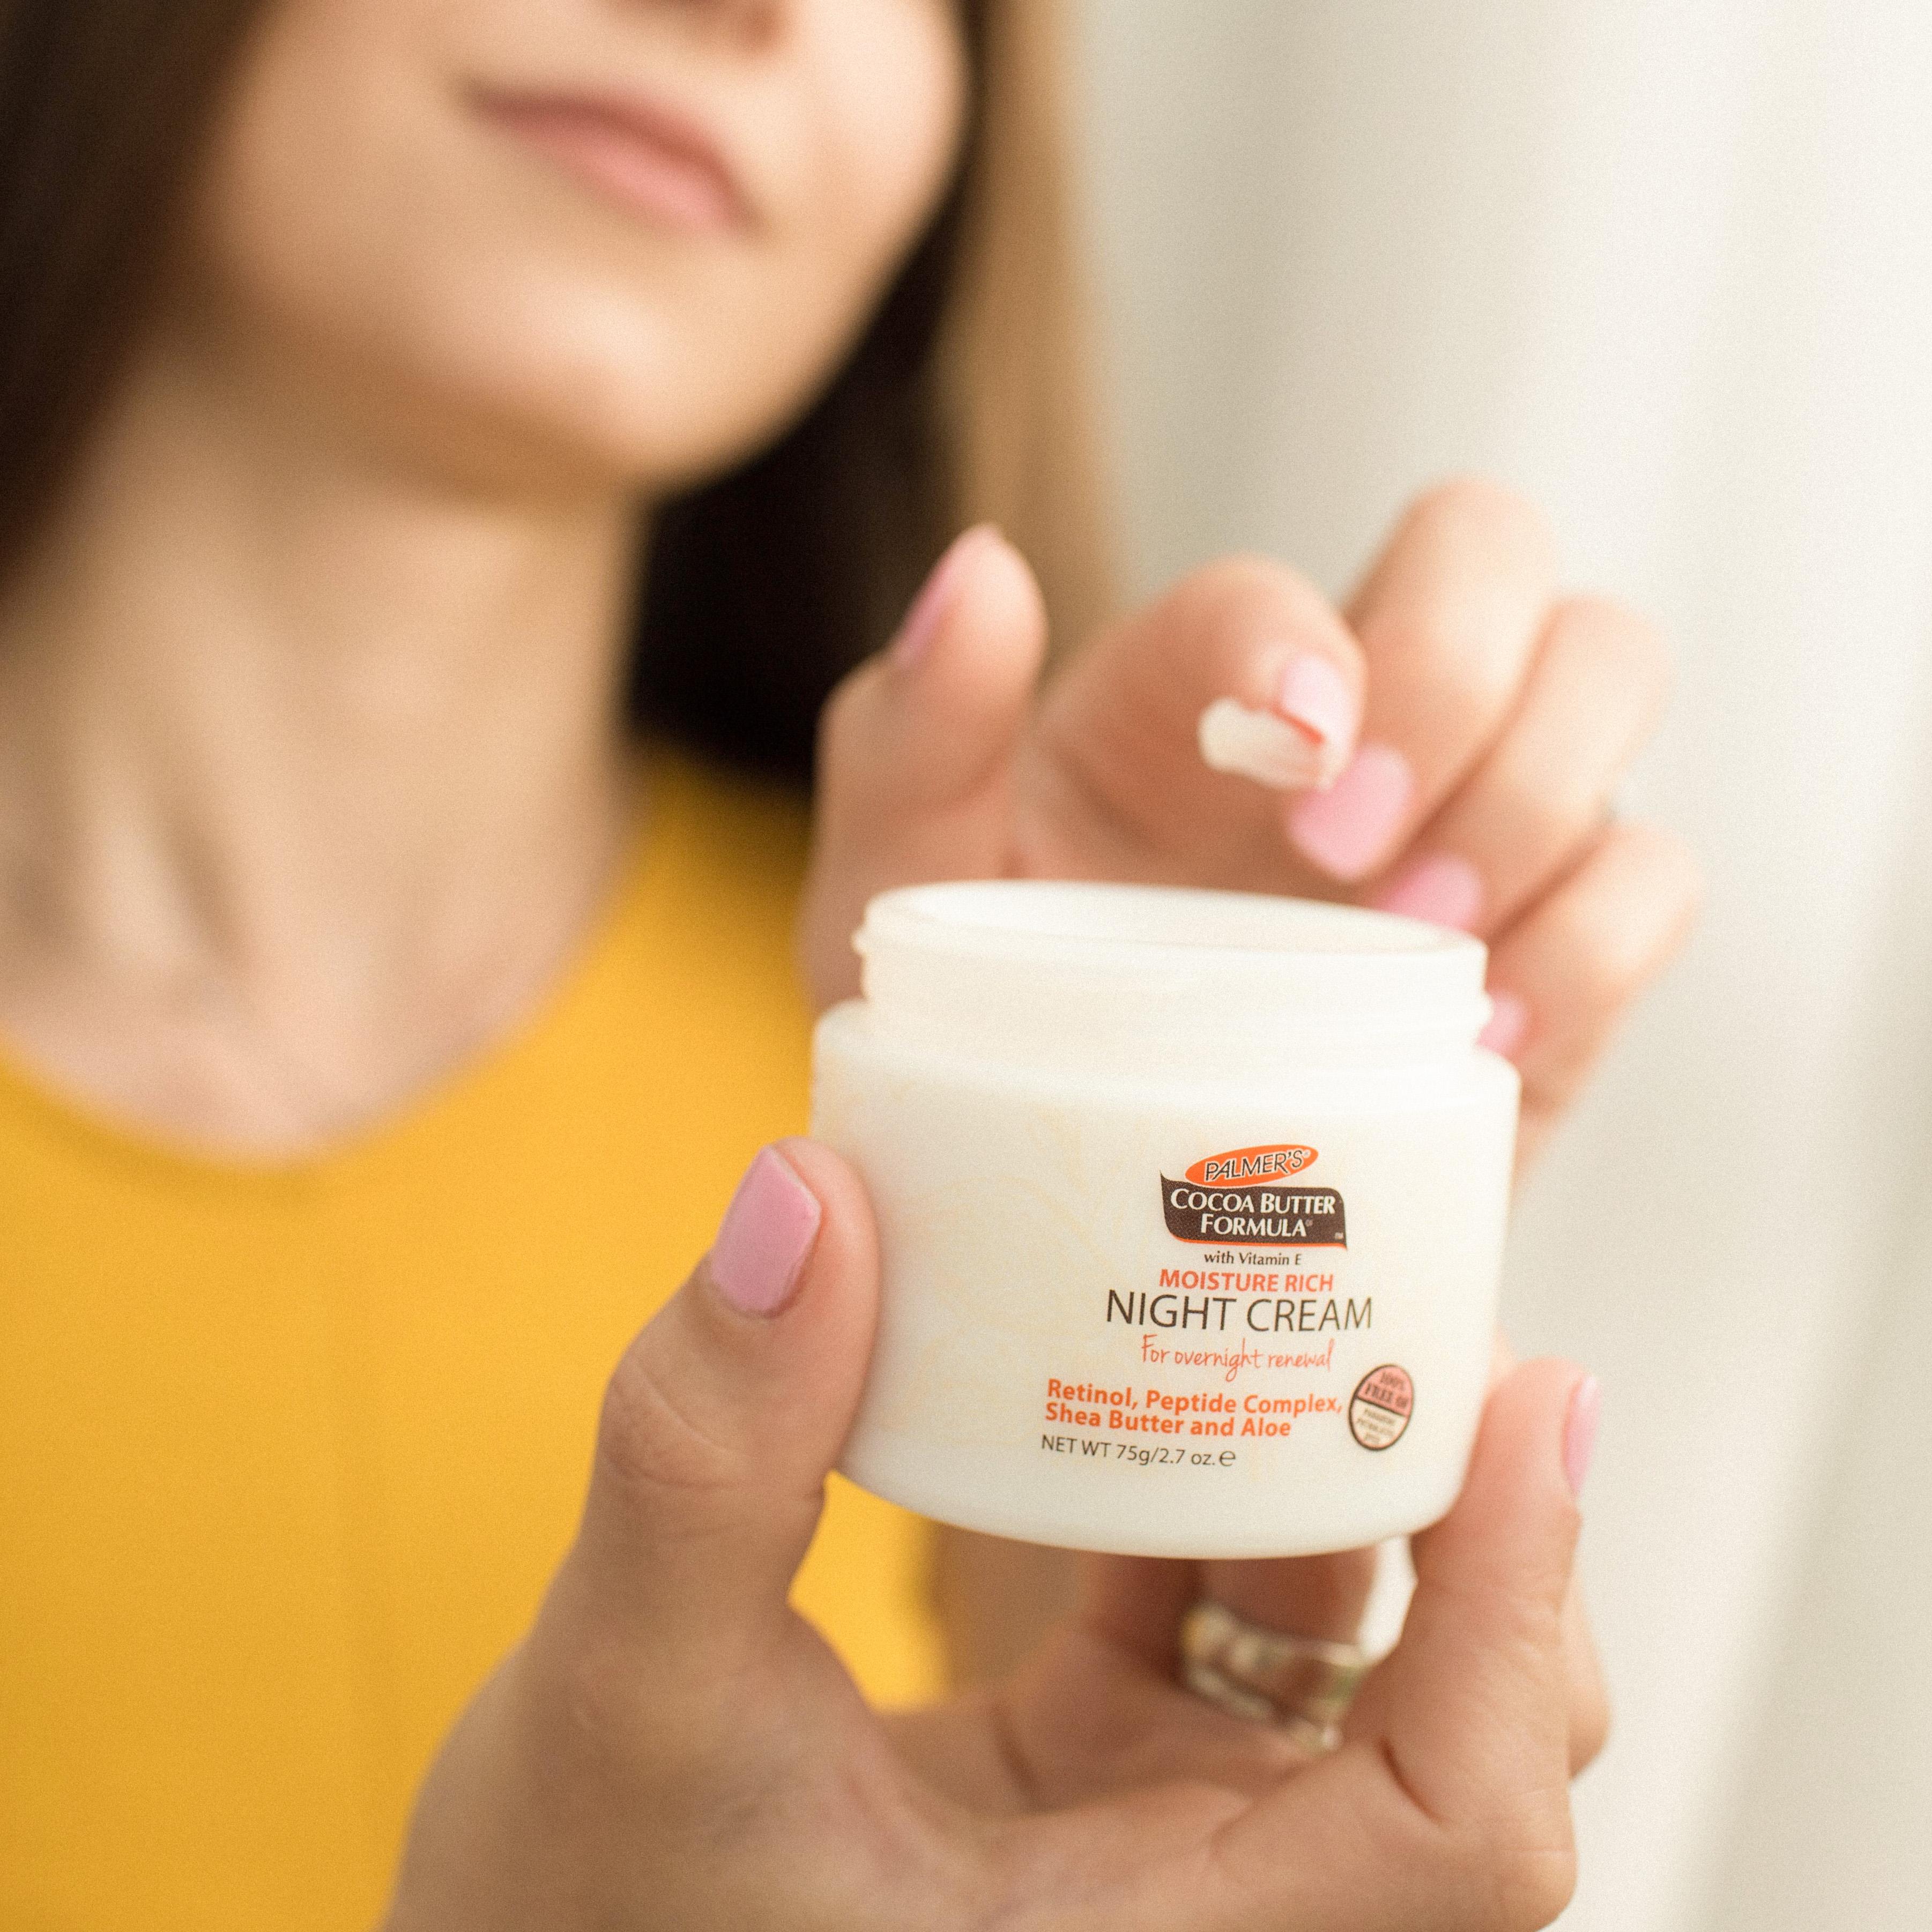 Palmer's Cocoa Butter Formula Moisture Rich Night Cream, a retinol night cream, in hand